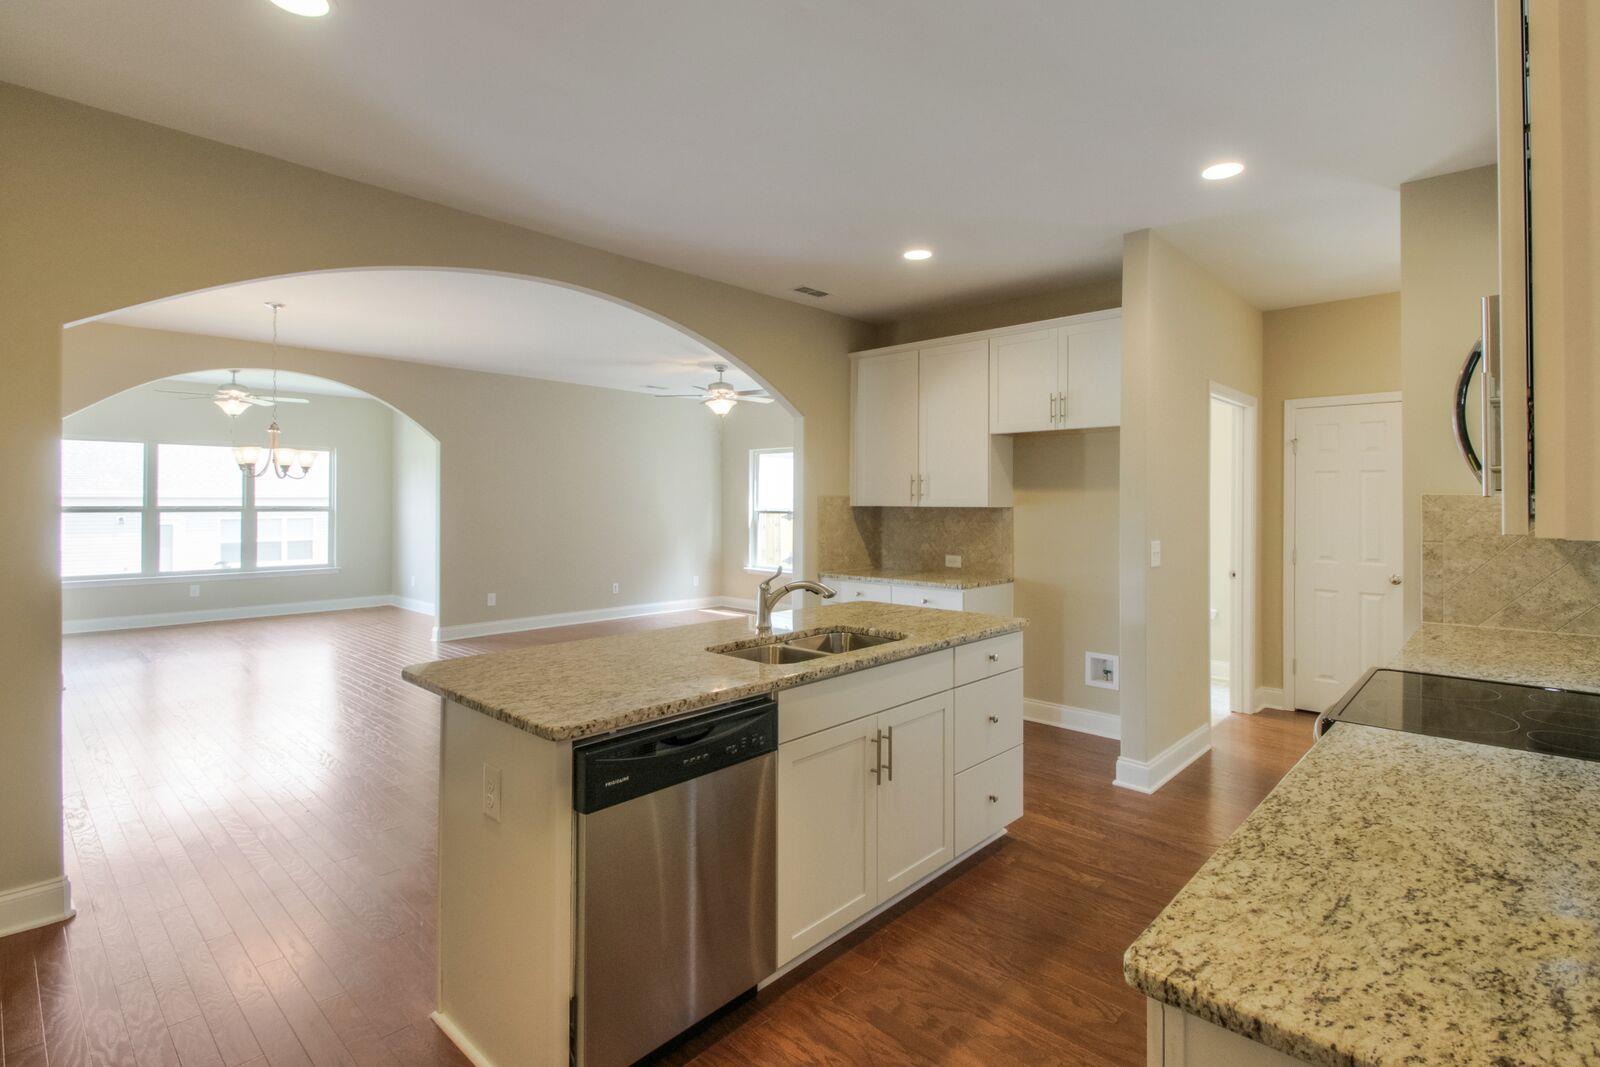 1004 Alexandria Way, Lebanon in Wilson County County, TN 37087 Home for Sale